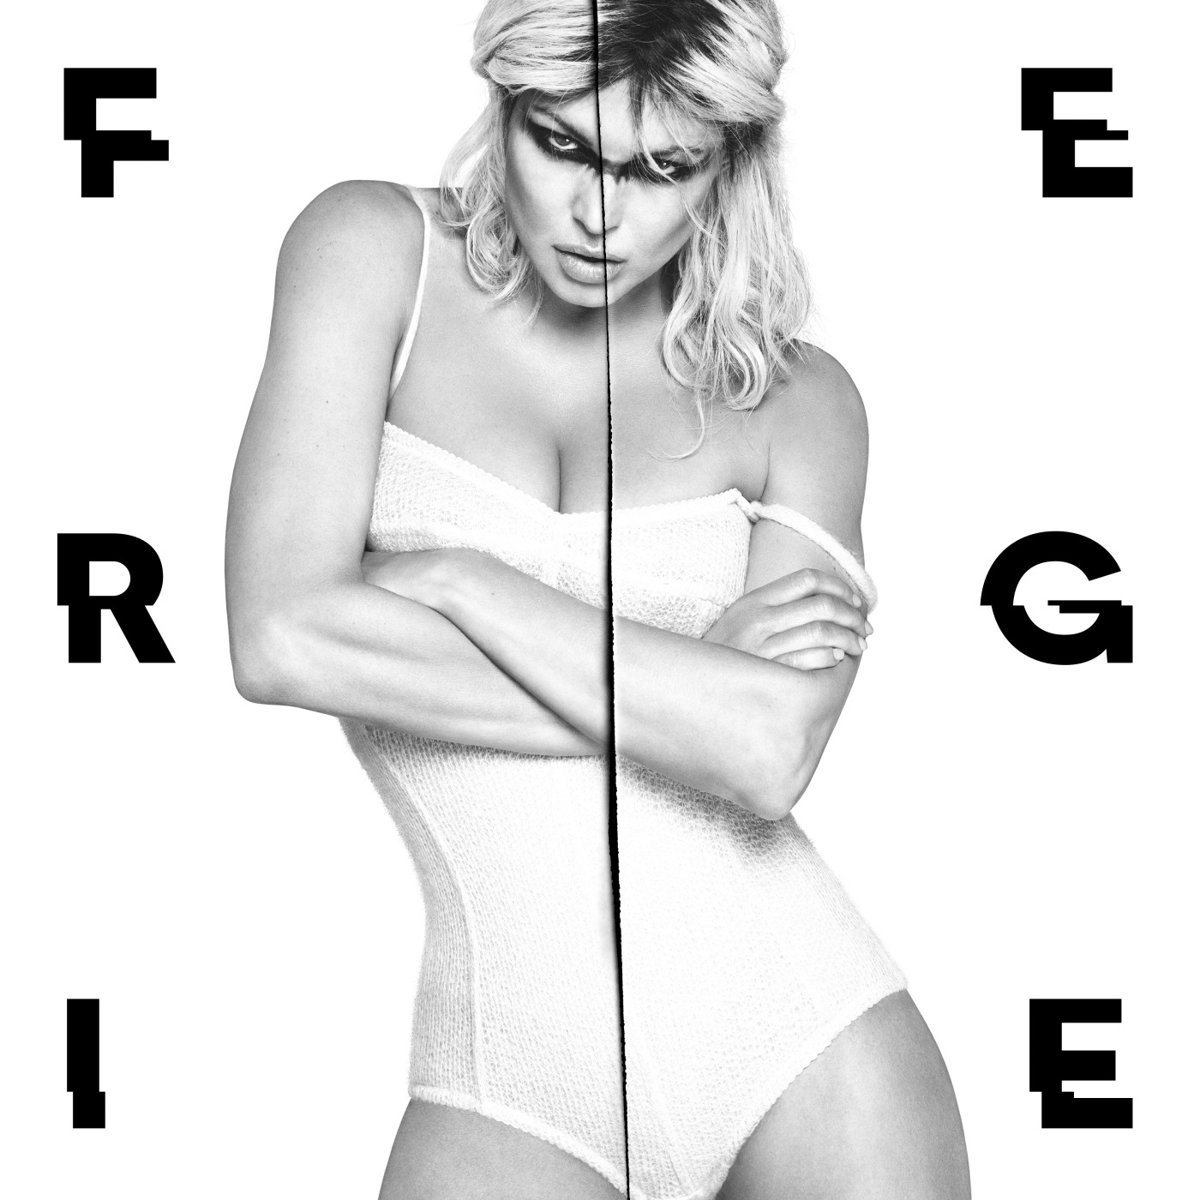 【輸入盤】Double Dutchess [ Fergie (Black Eyed Peas) ]